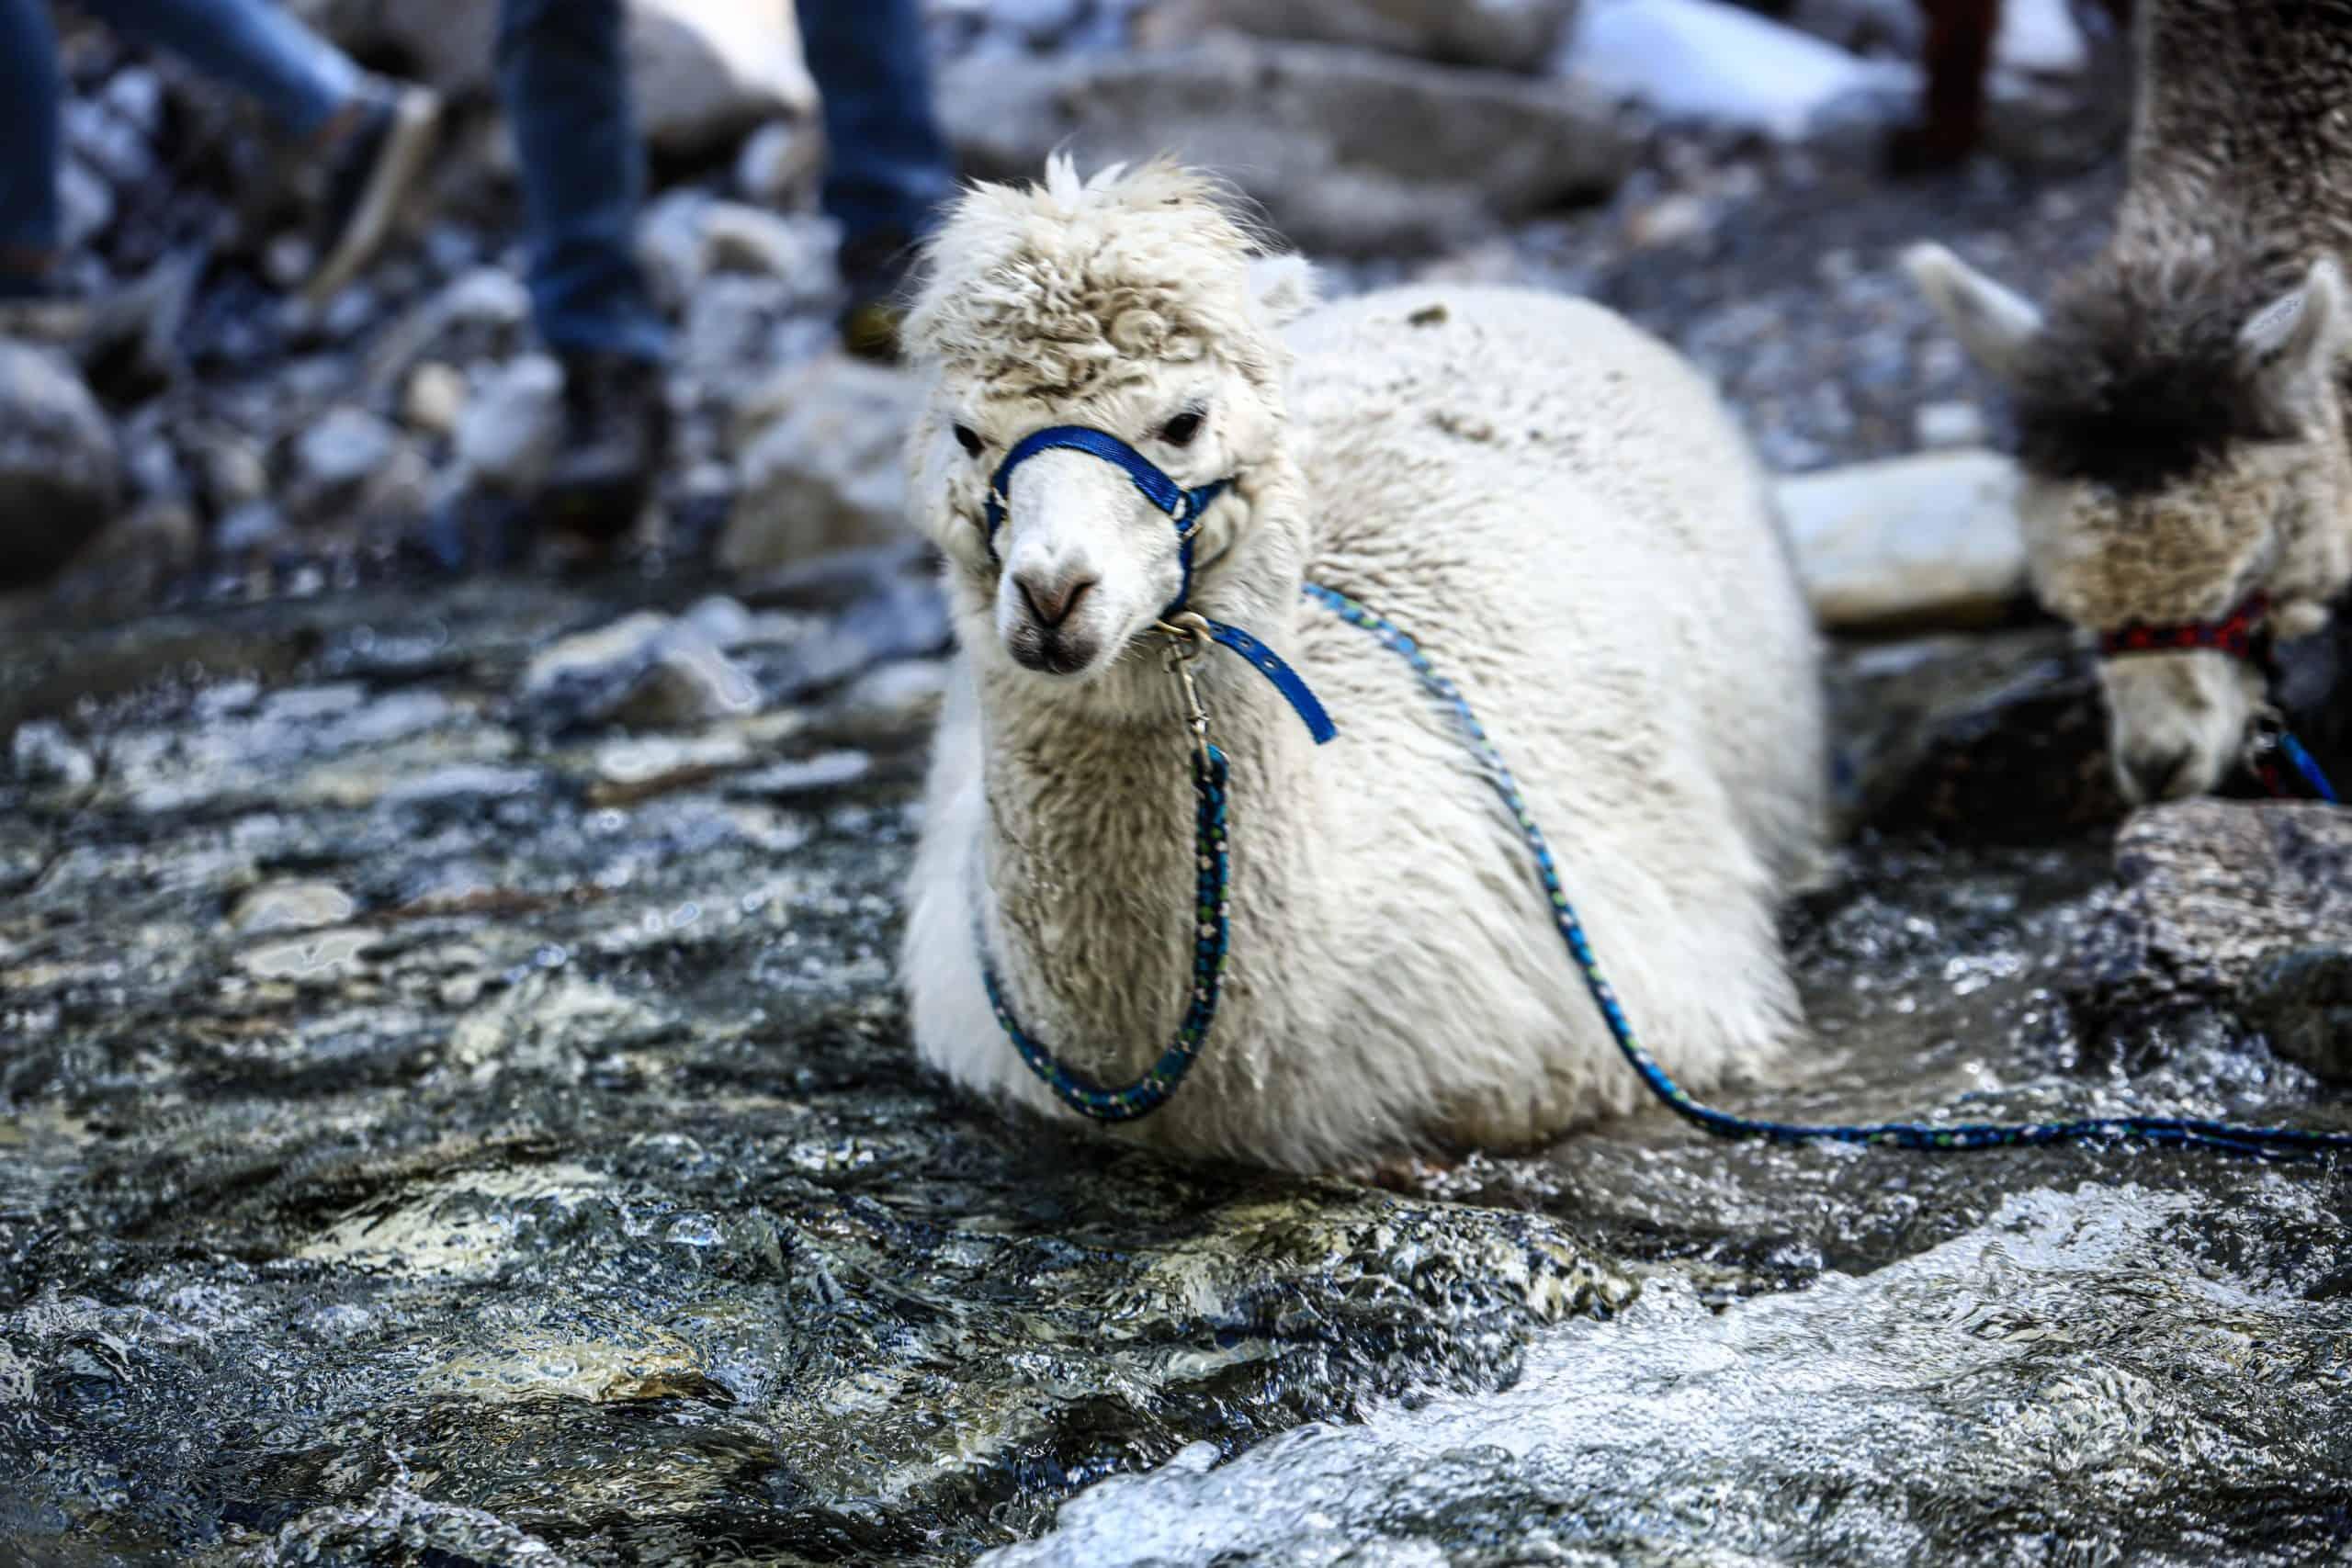 Gschnitzer_Alpaka-Alpakas-Wanderungen-Tirol-09-scaled unsere Herde